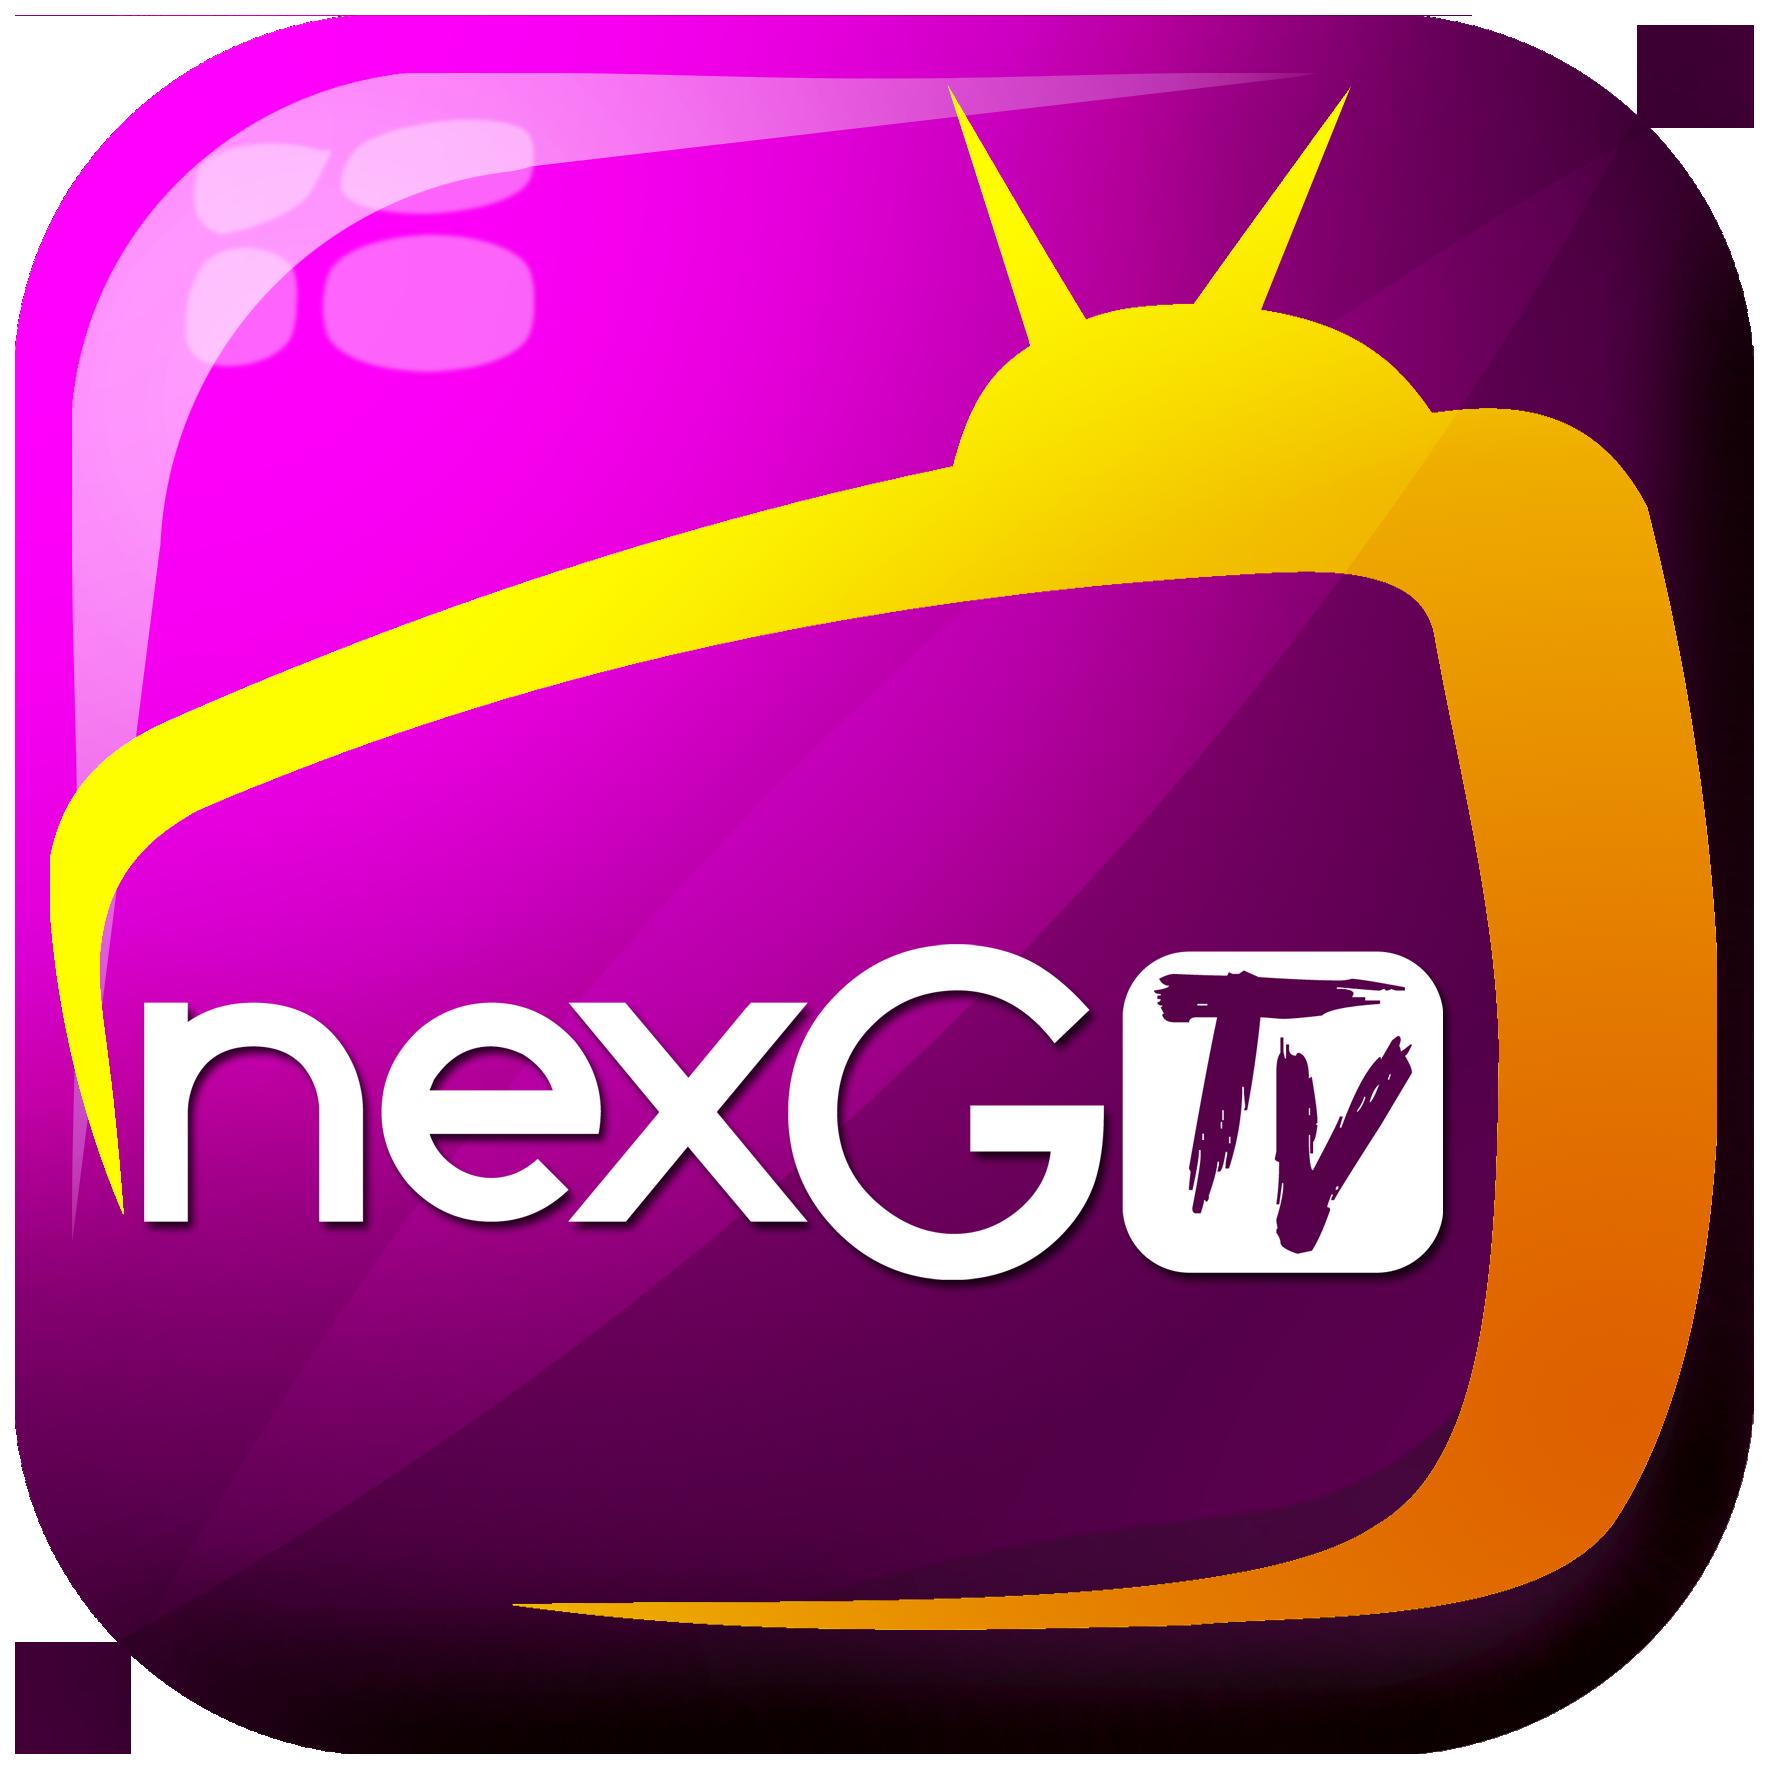 ItVoice | Online IT Magazine India » NexGTv Boosts Its Content